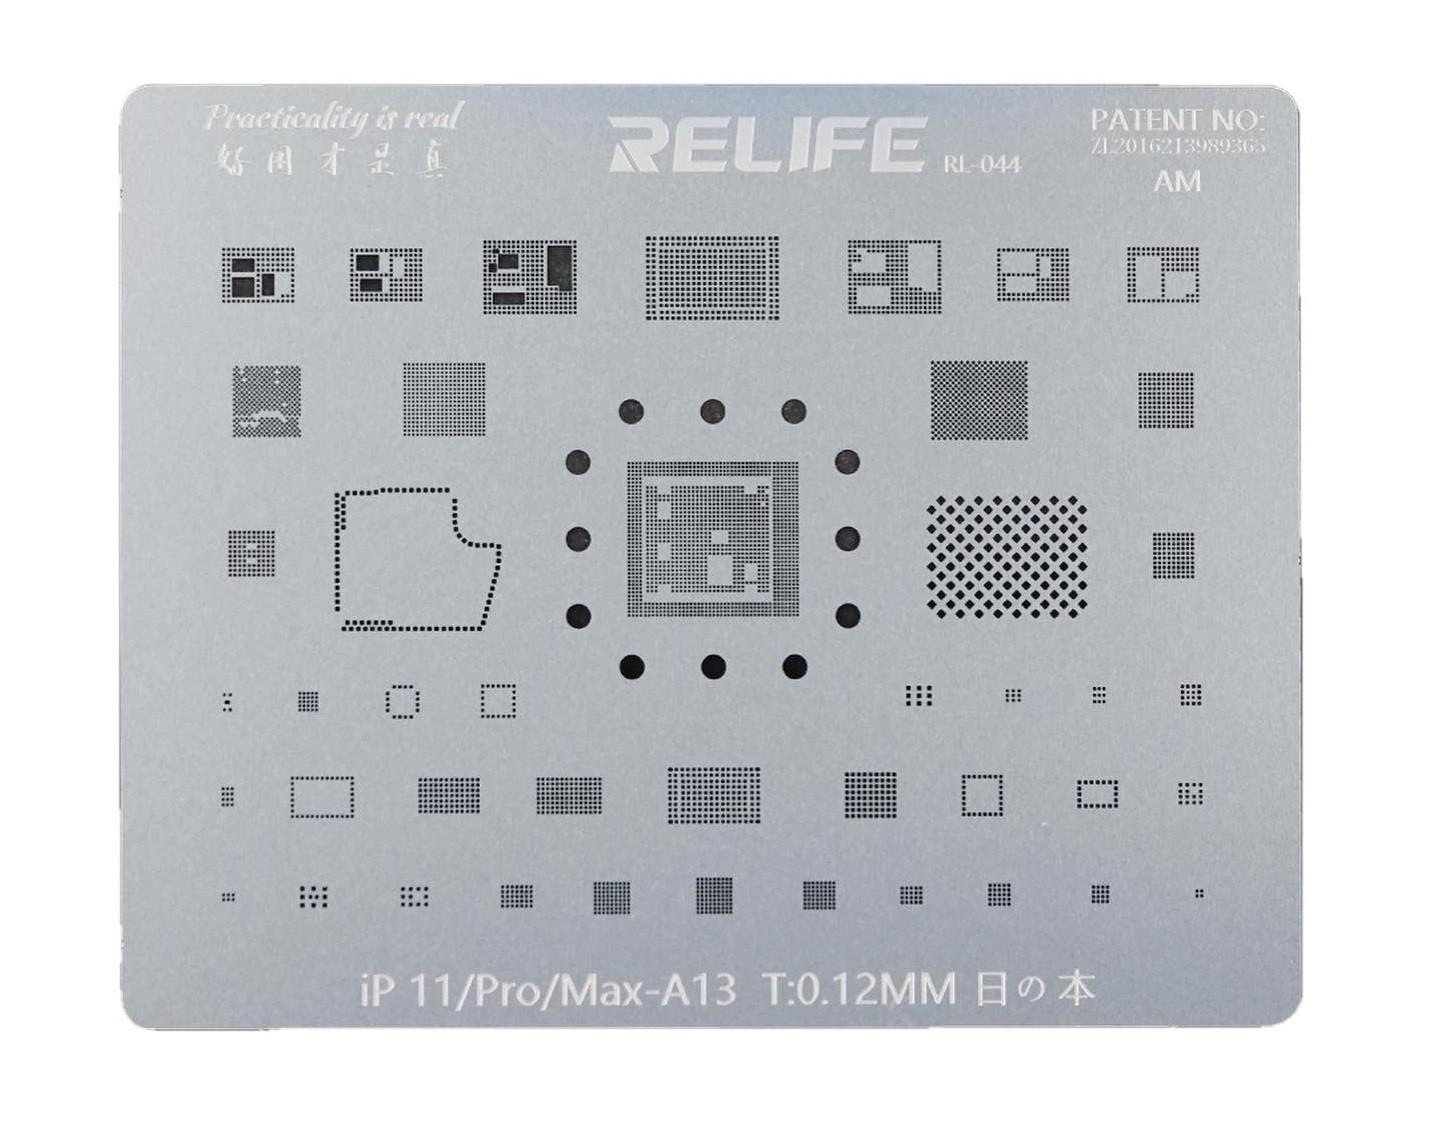 Relife Rl-044 Stencil Para iPhone 11, 11 pro, 11 pro max ics e CPU A13